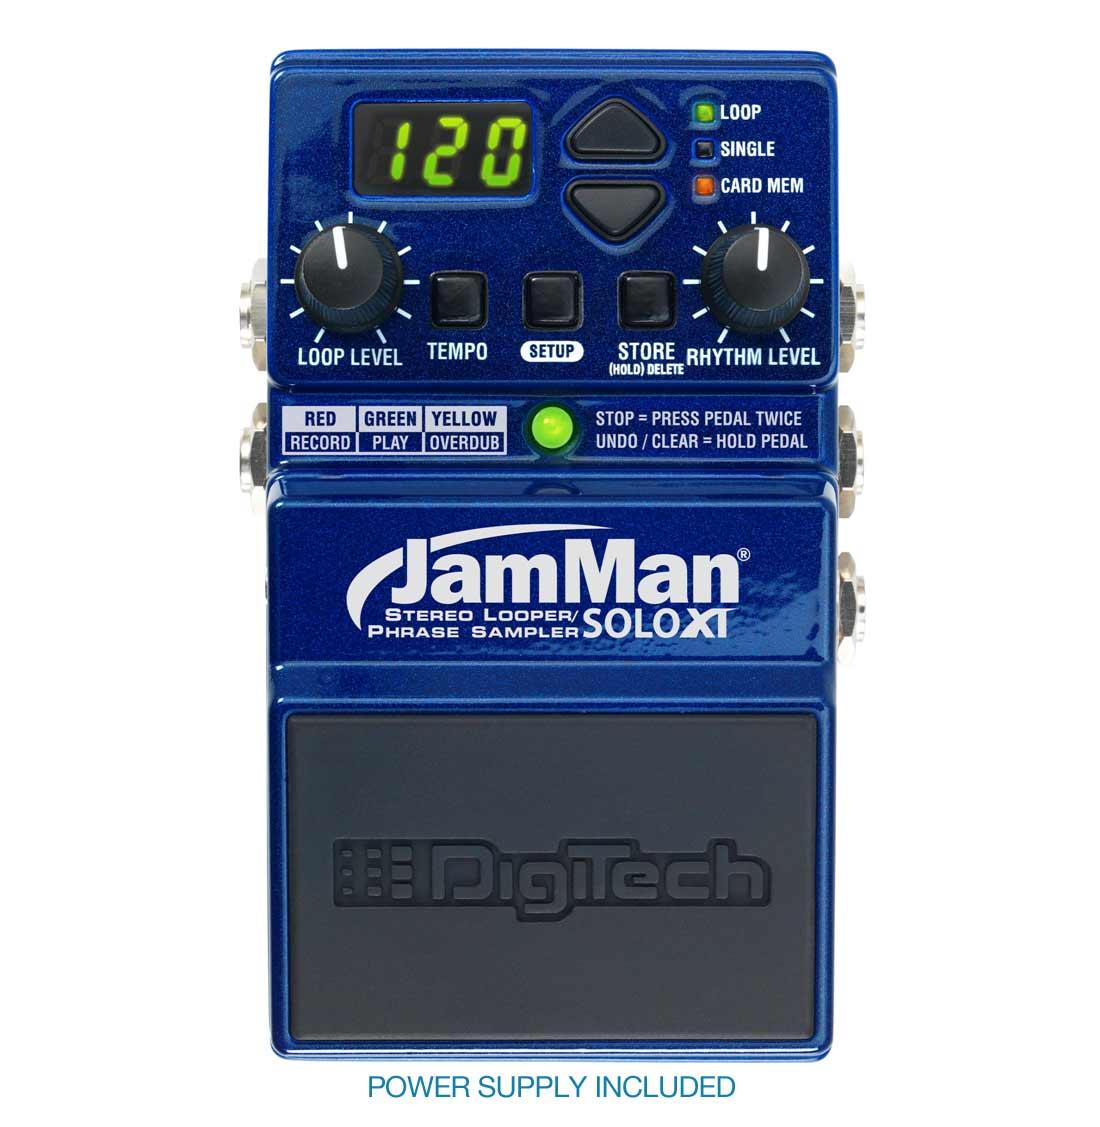 Digitech JamMan Solo XT loop-pedal